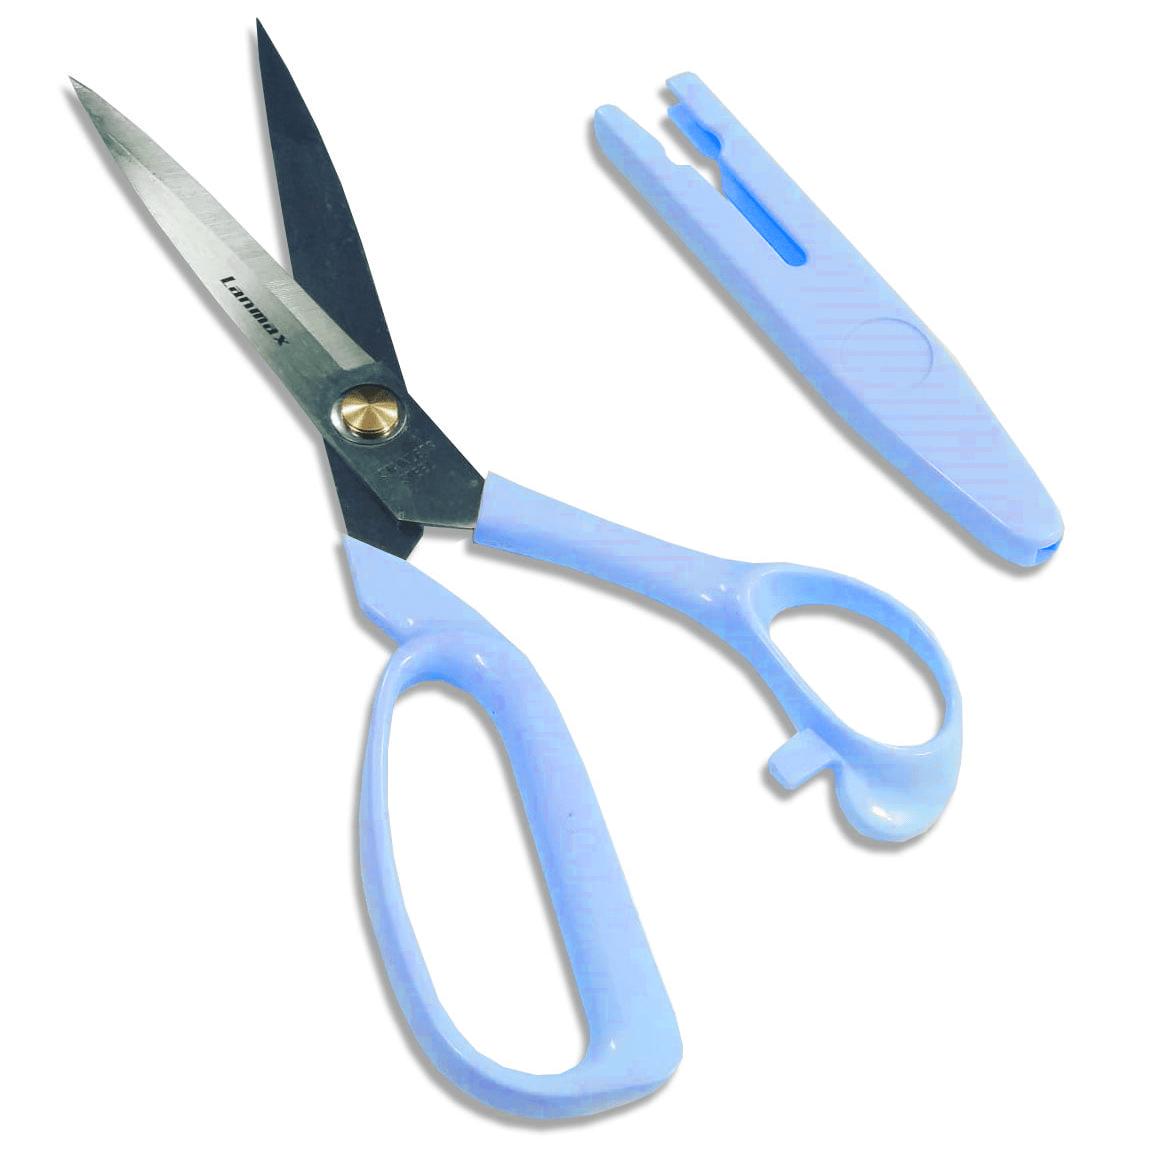 Tesoura Com Protetor 9 - Azul Lanmax p27431_AZUL